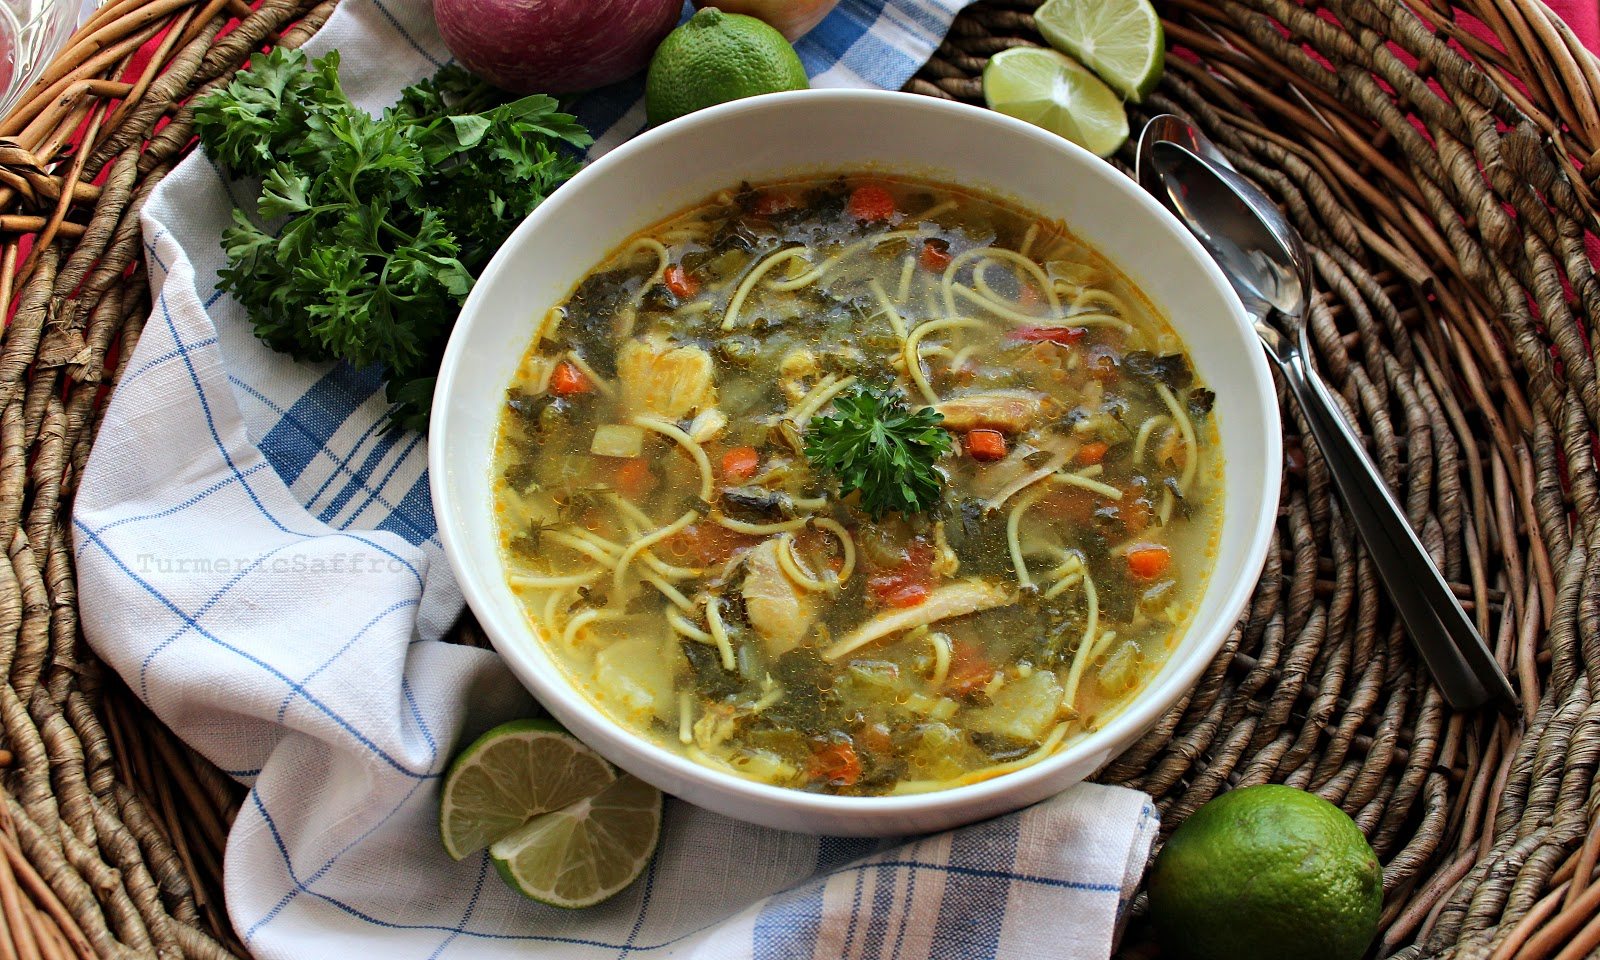 Soup E Morgh O Sabzijat Maman S Feel Good Chicken Vegetable Soup